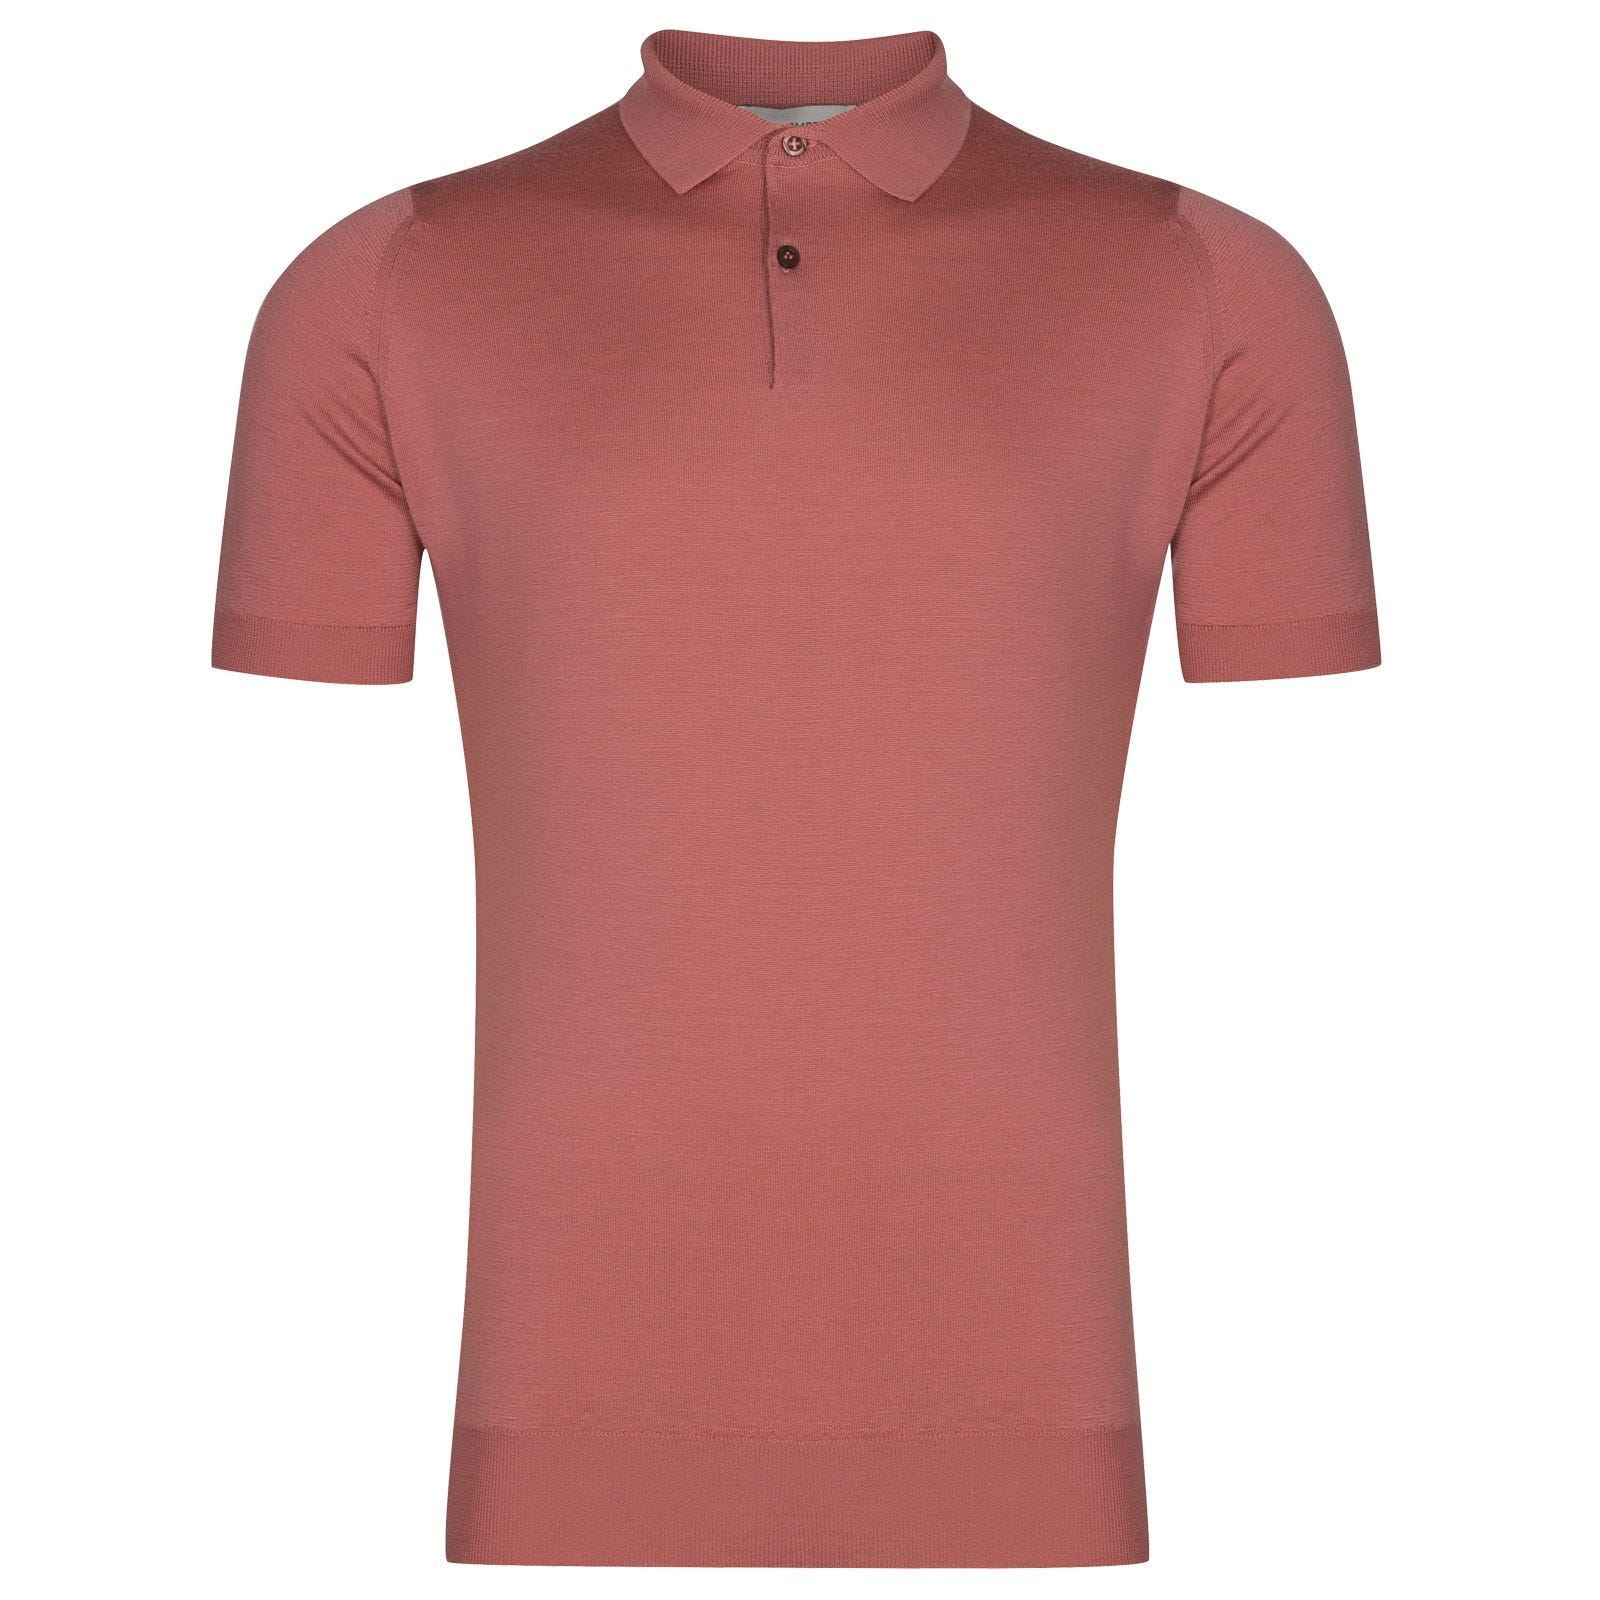 John Smedley Payton in Azalea Pink Shirt-LGE